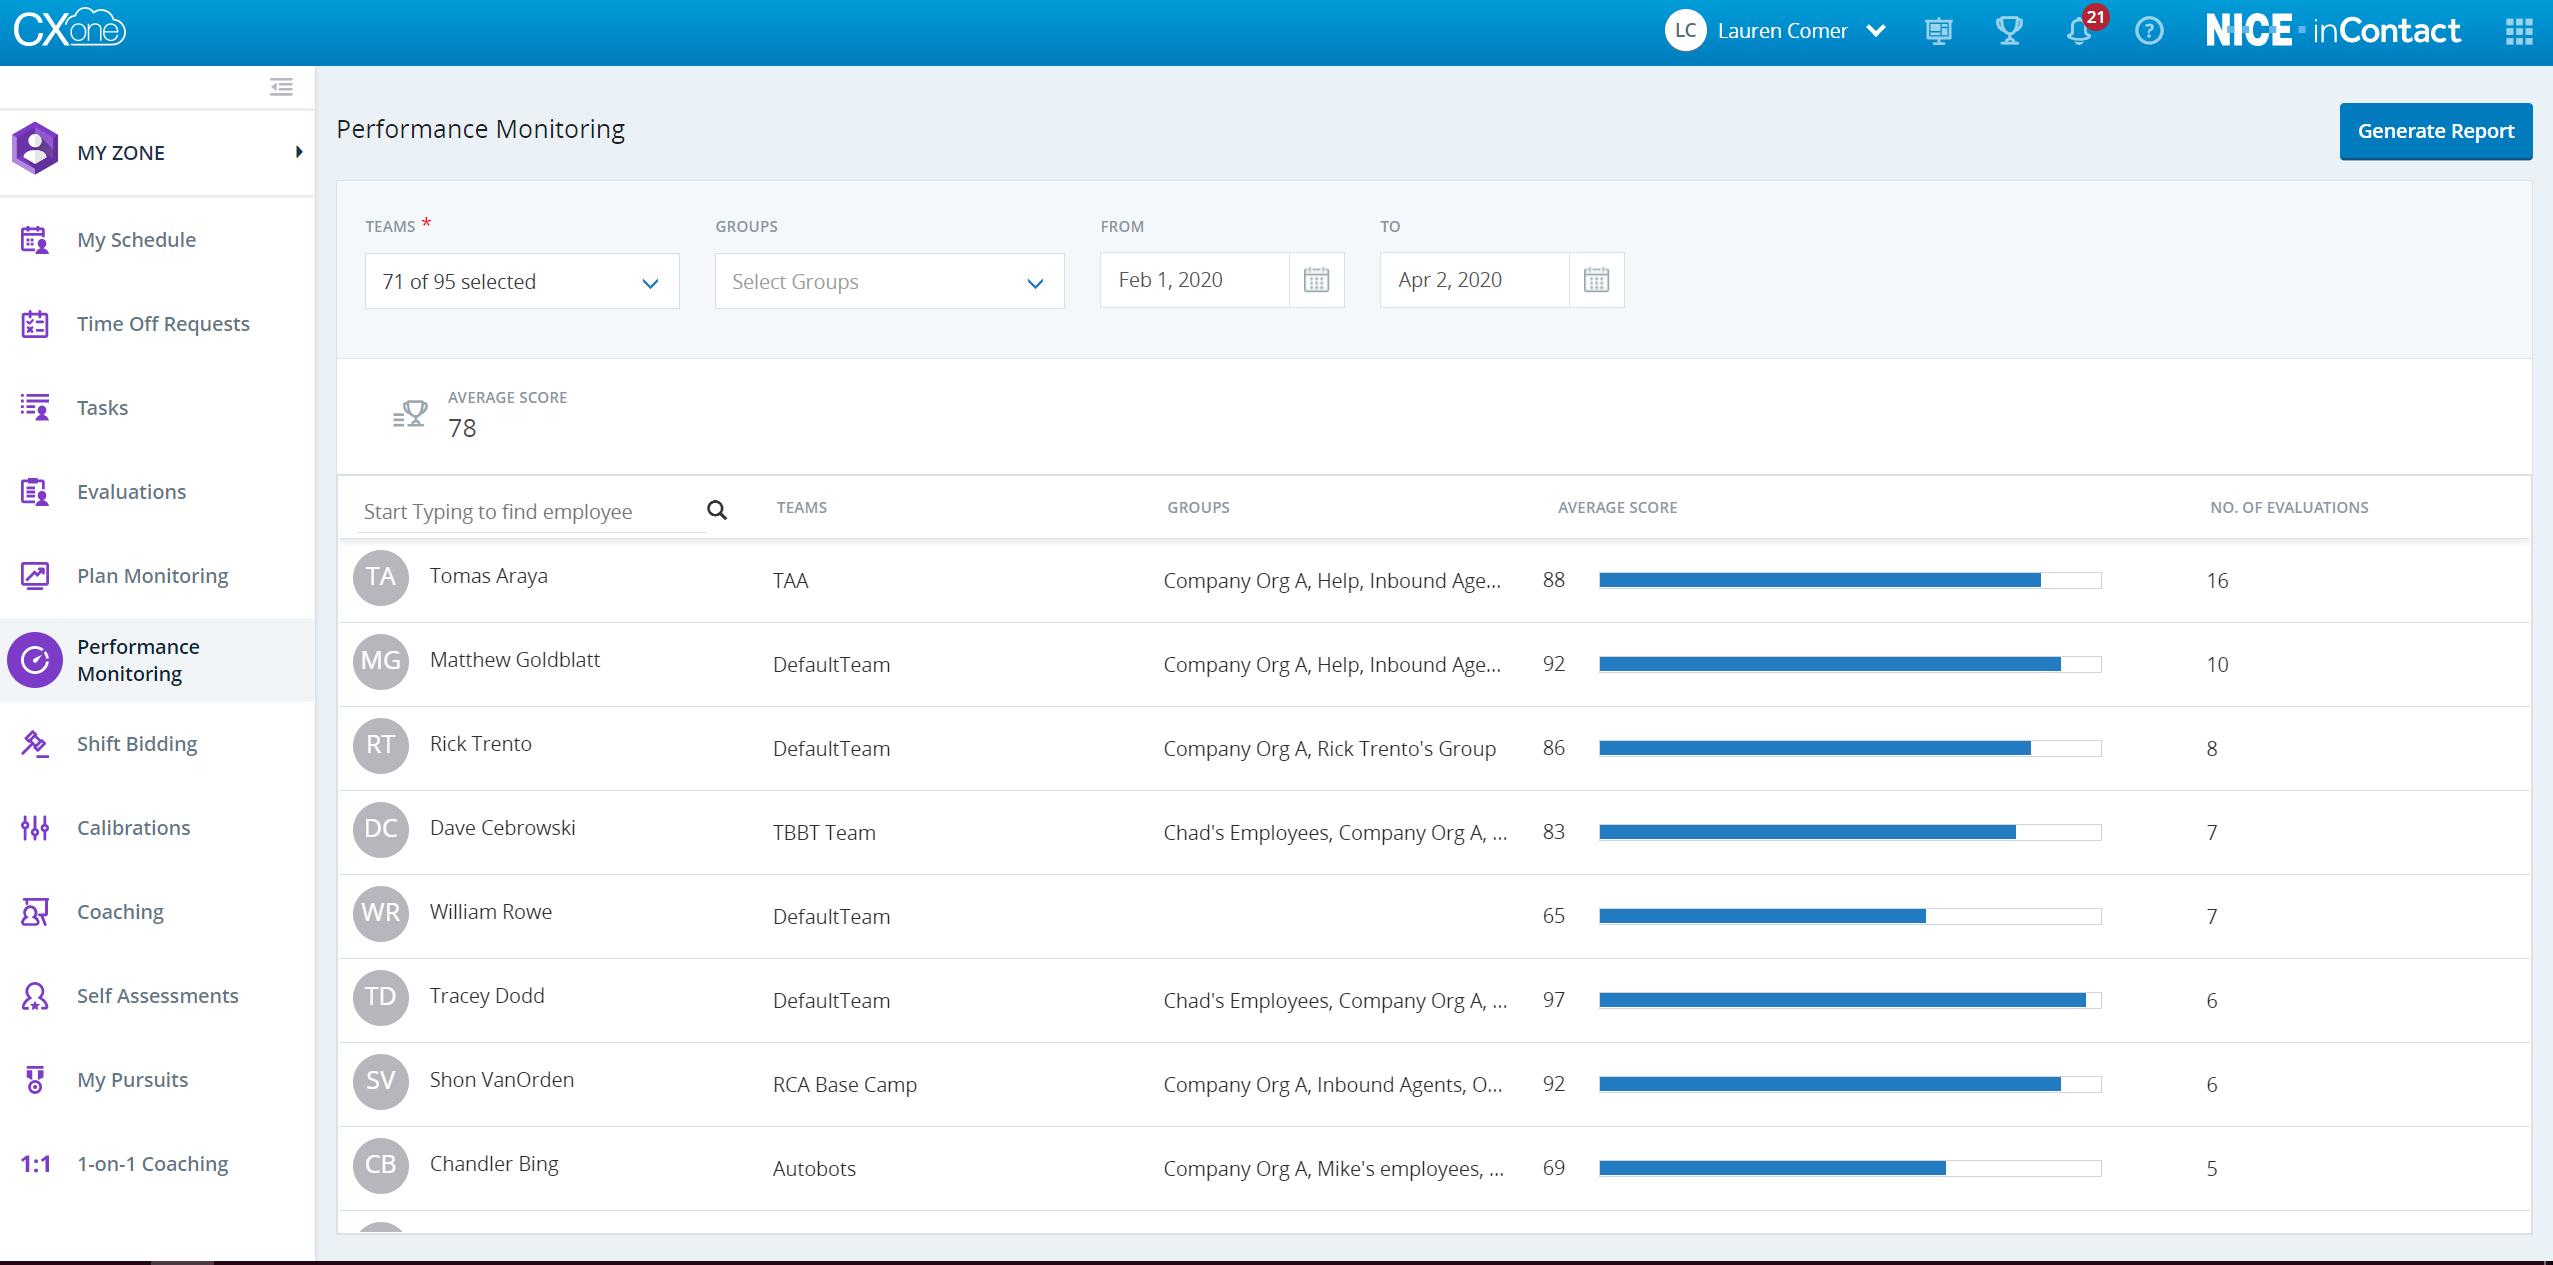 NICE CXone Software - NICE CXone performance monitoring